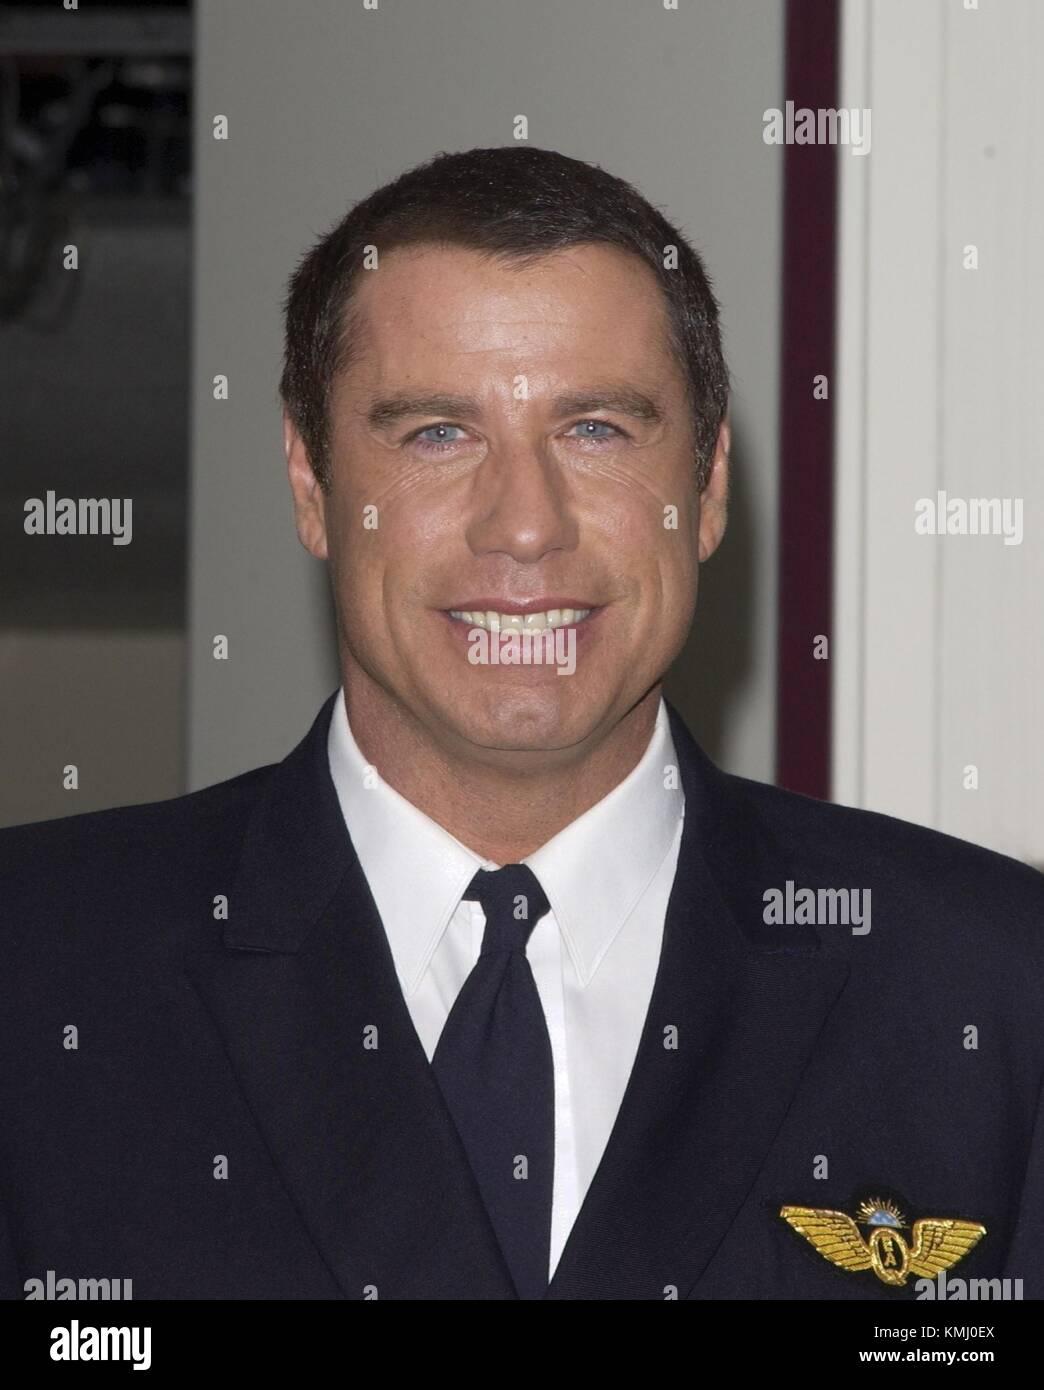 Jett Travolta Stock Photos & Jett Travolta Stock Images - Alamy